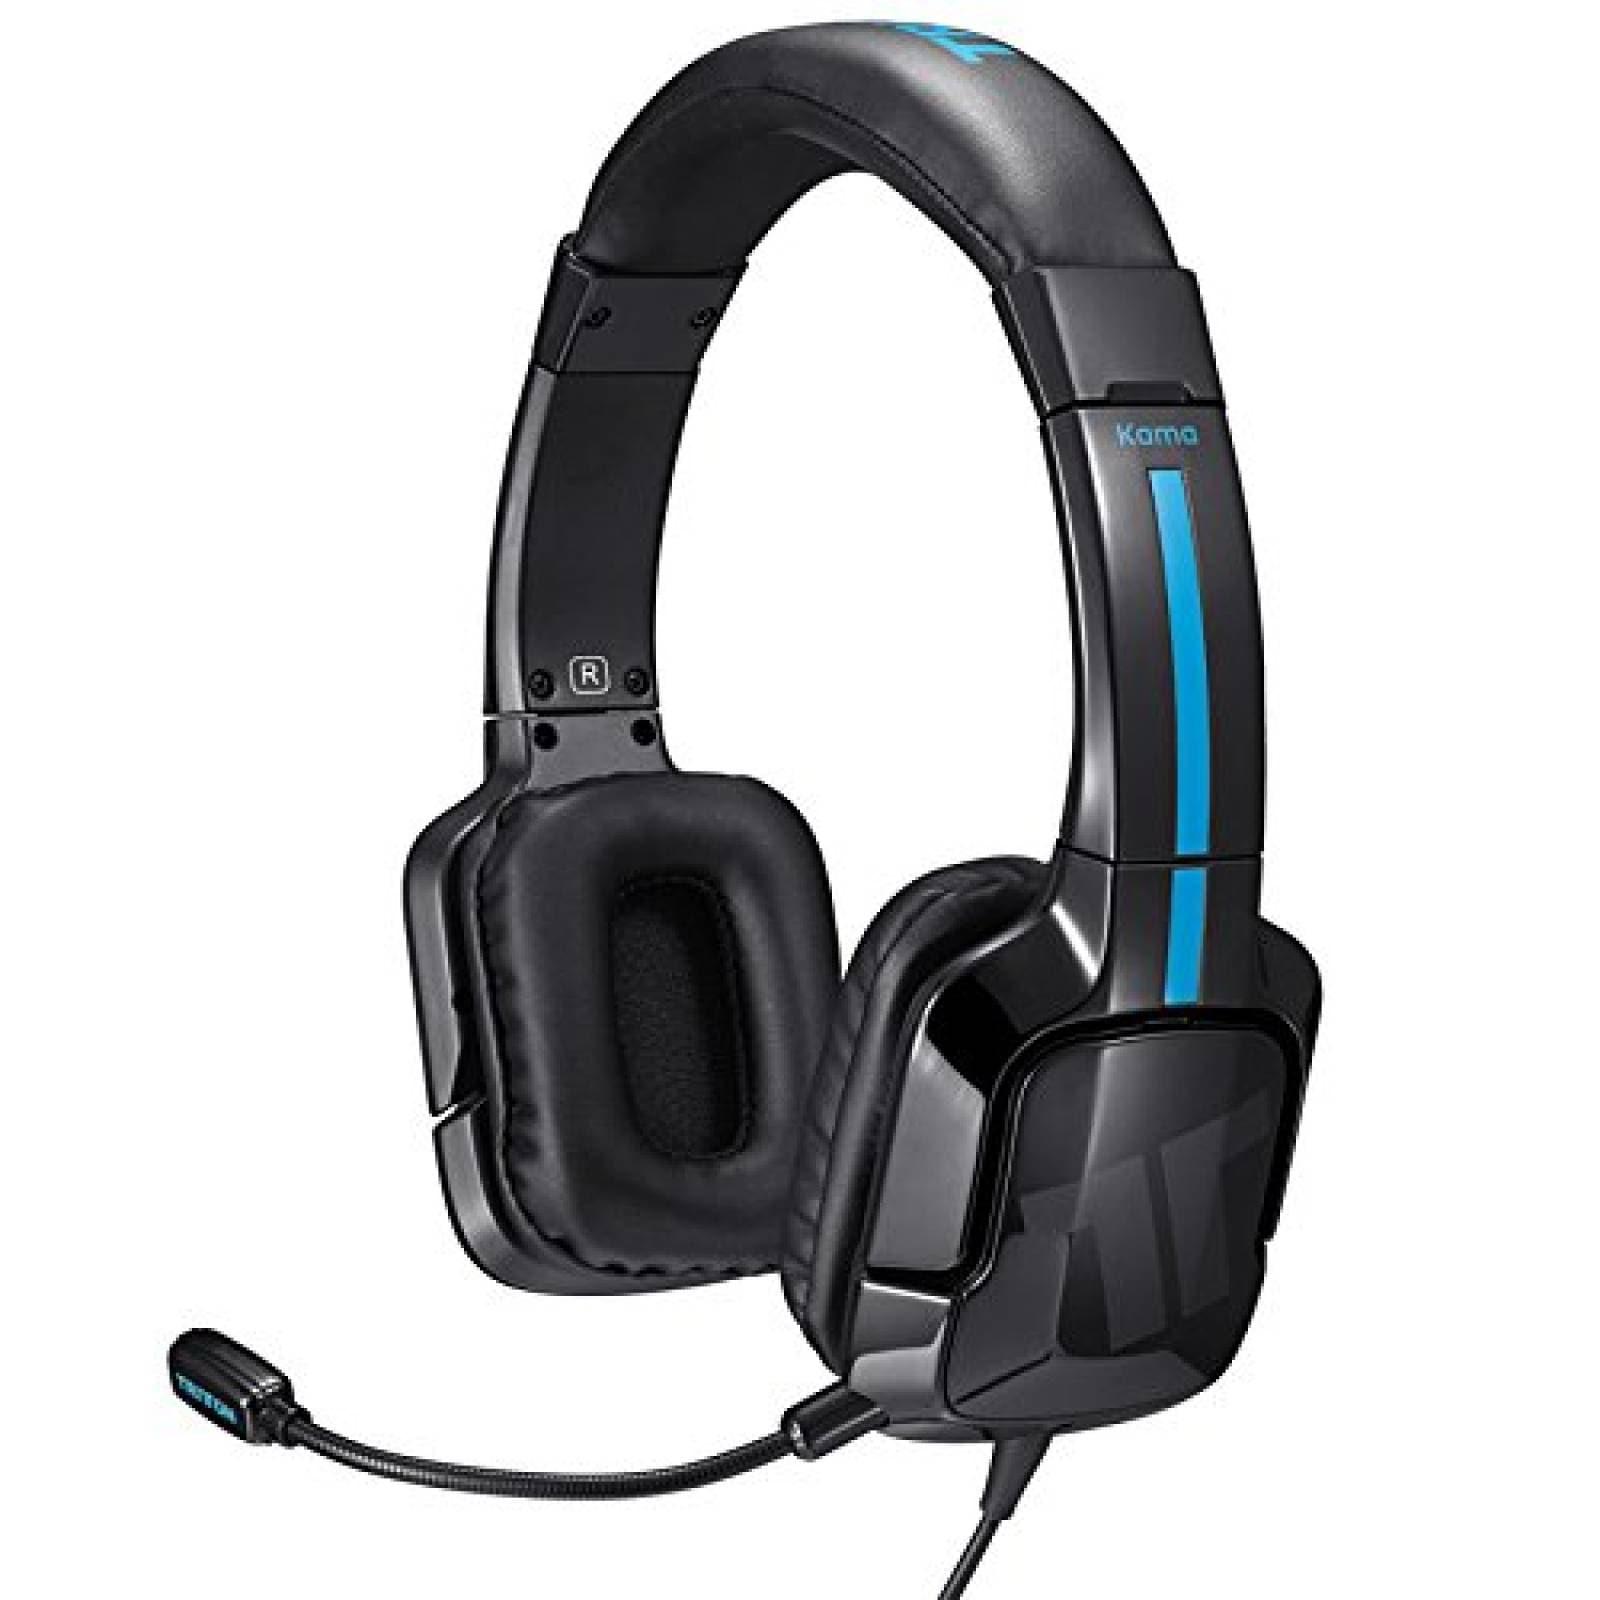 PS4 Diadema Kama Tritton Headset